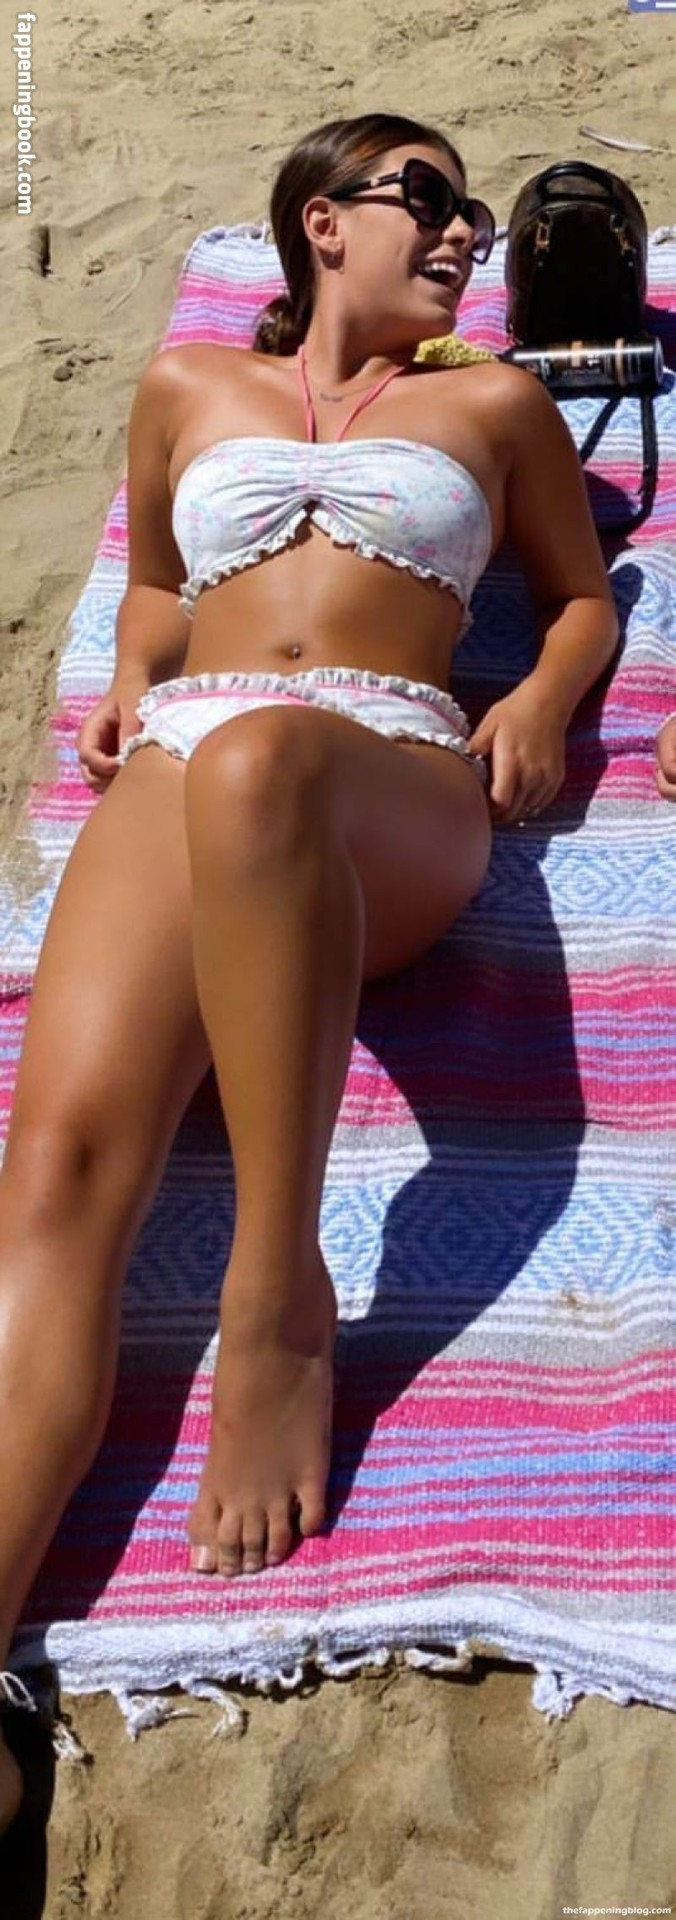 Madisyn Shipman Nude